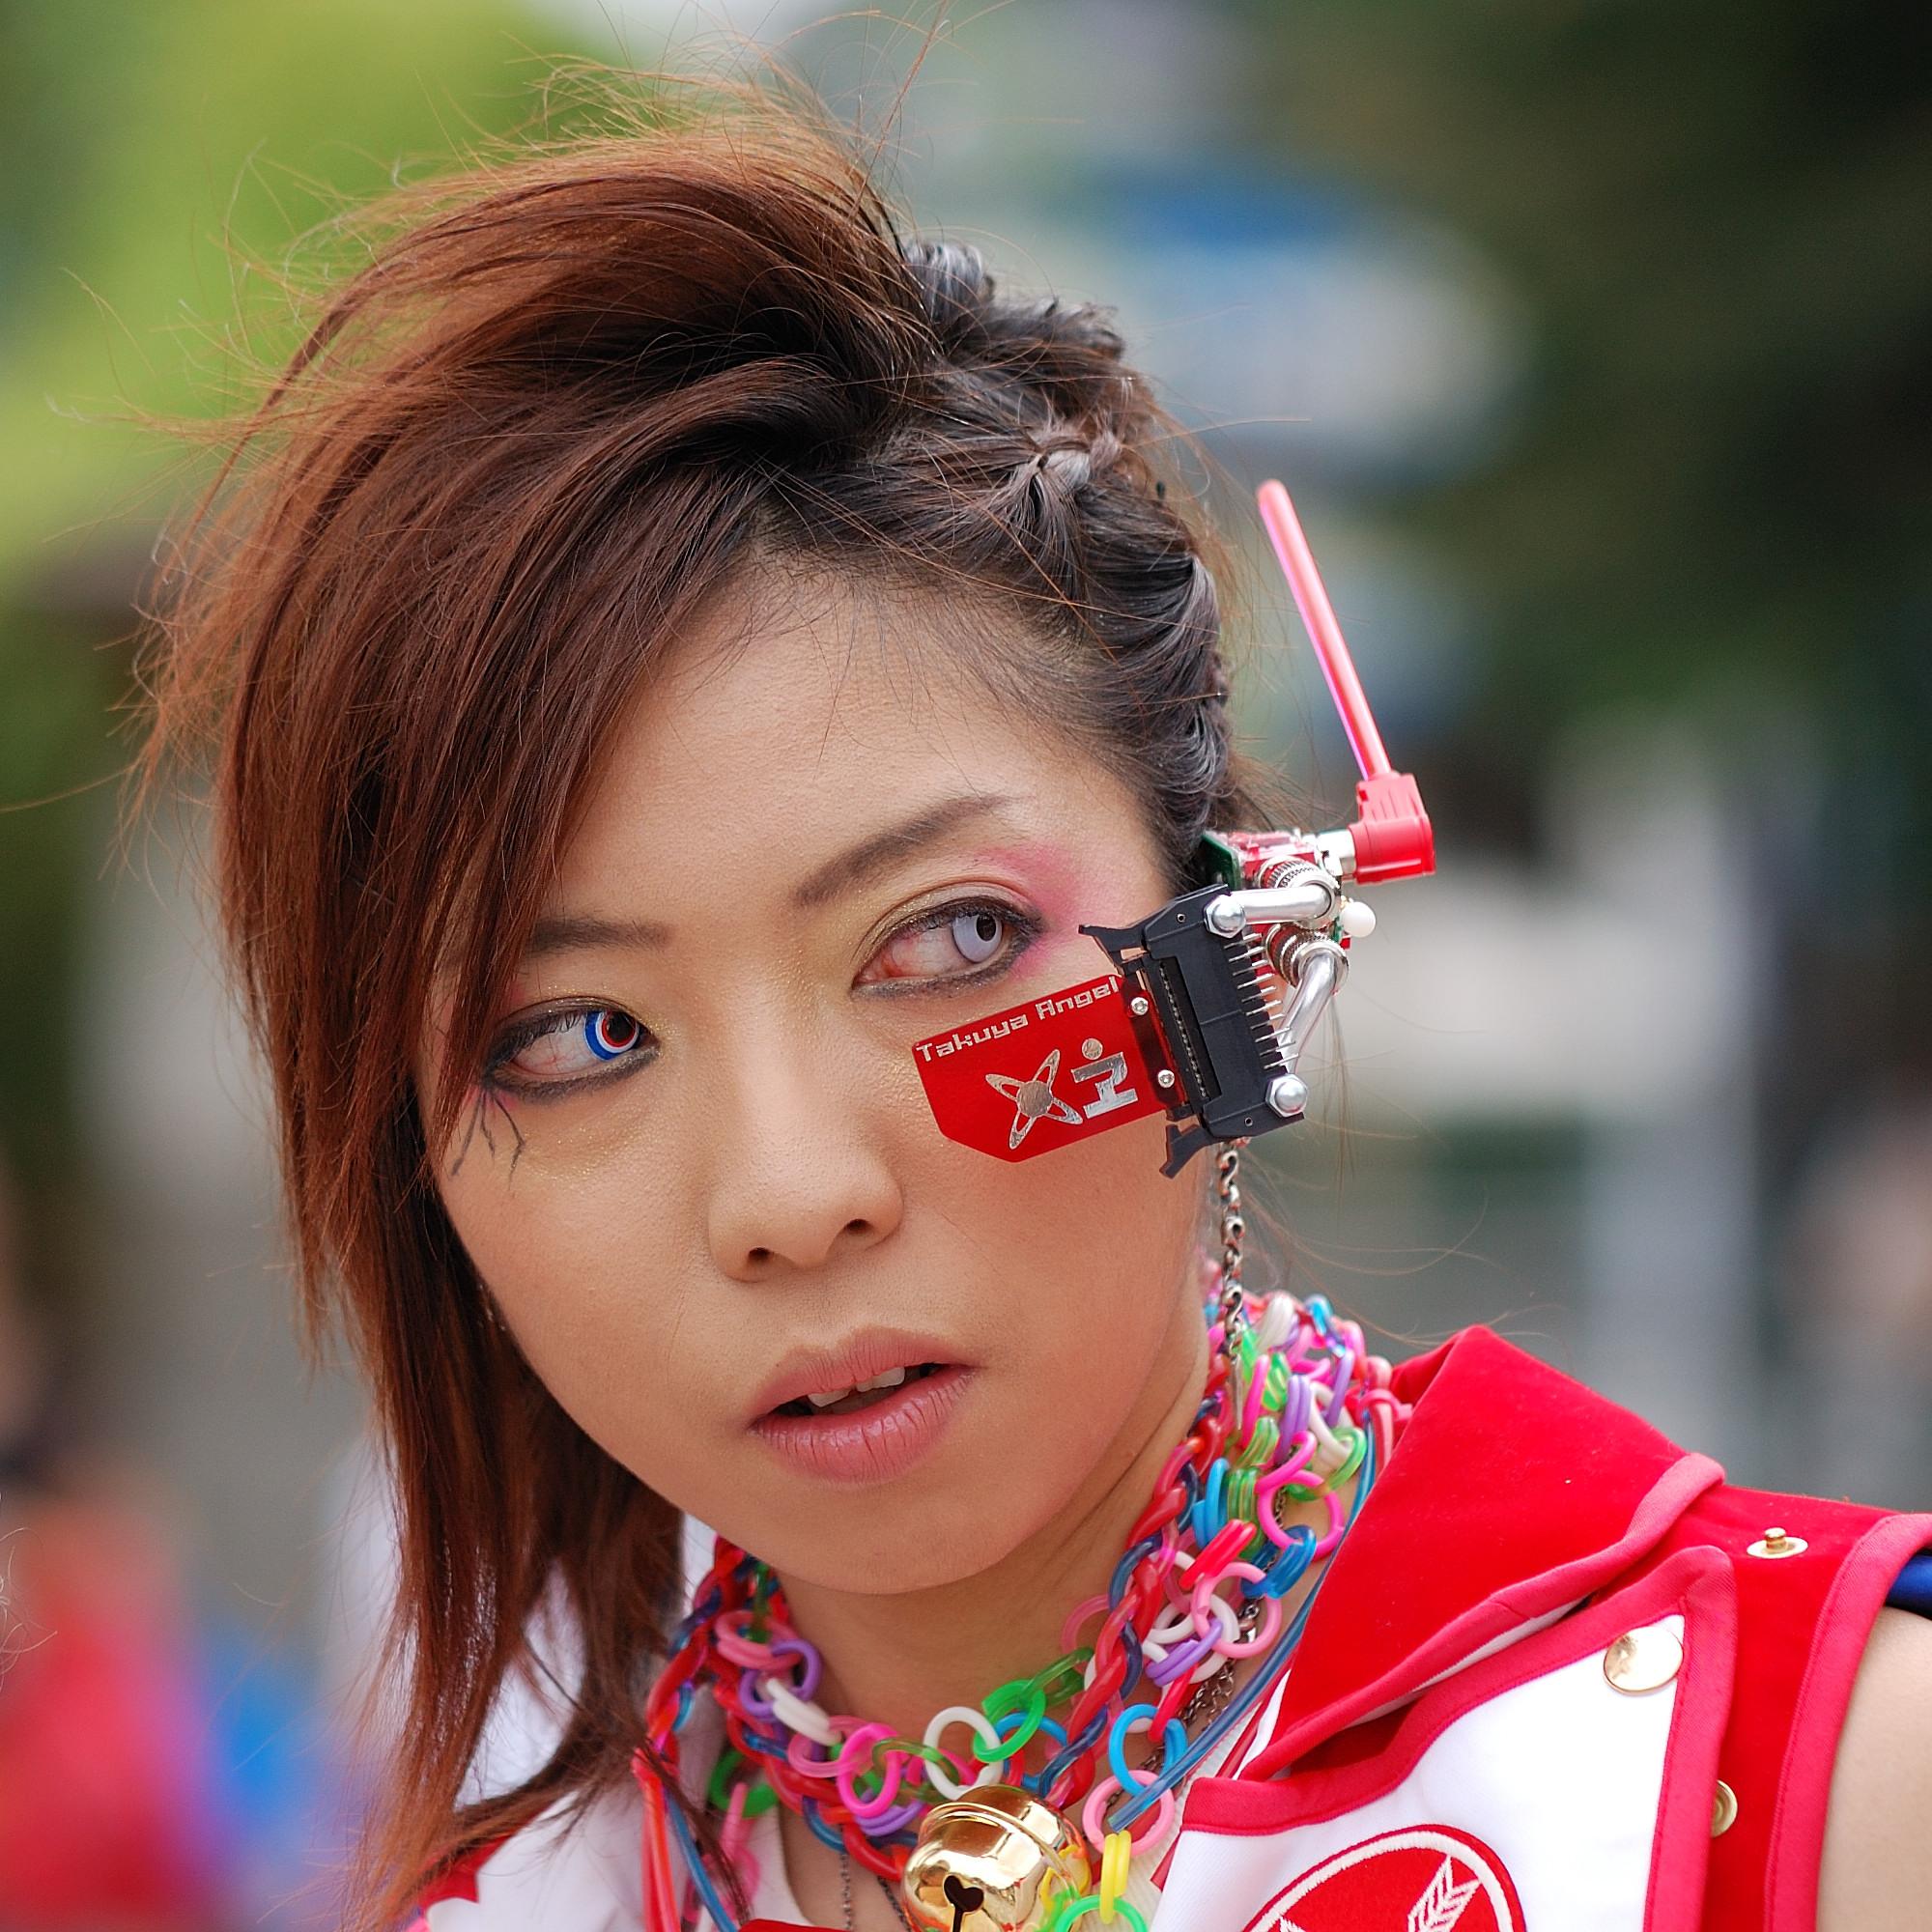 File:Harajuku gal.jpg - Wikimedia Commons